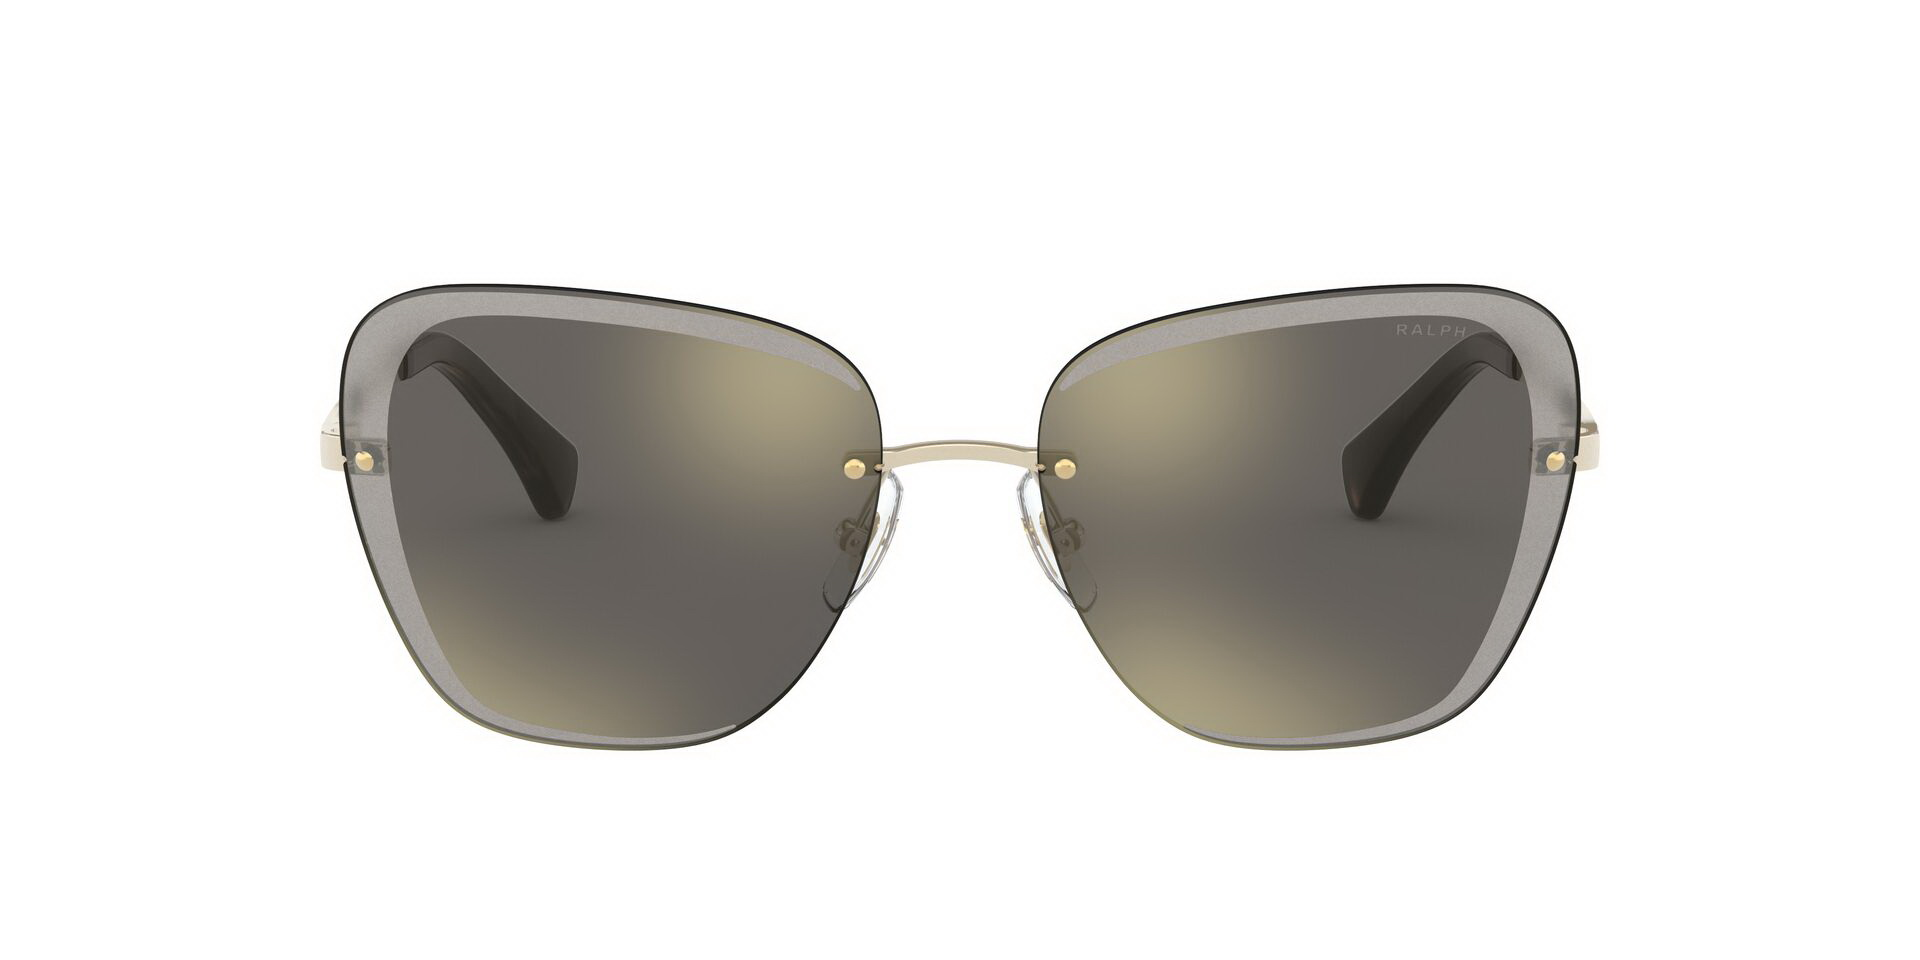 Солнцезащитные очки Очки с/з RALPH 0RA4129 93895A фото